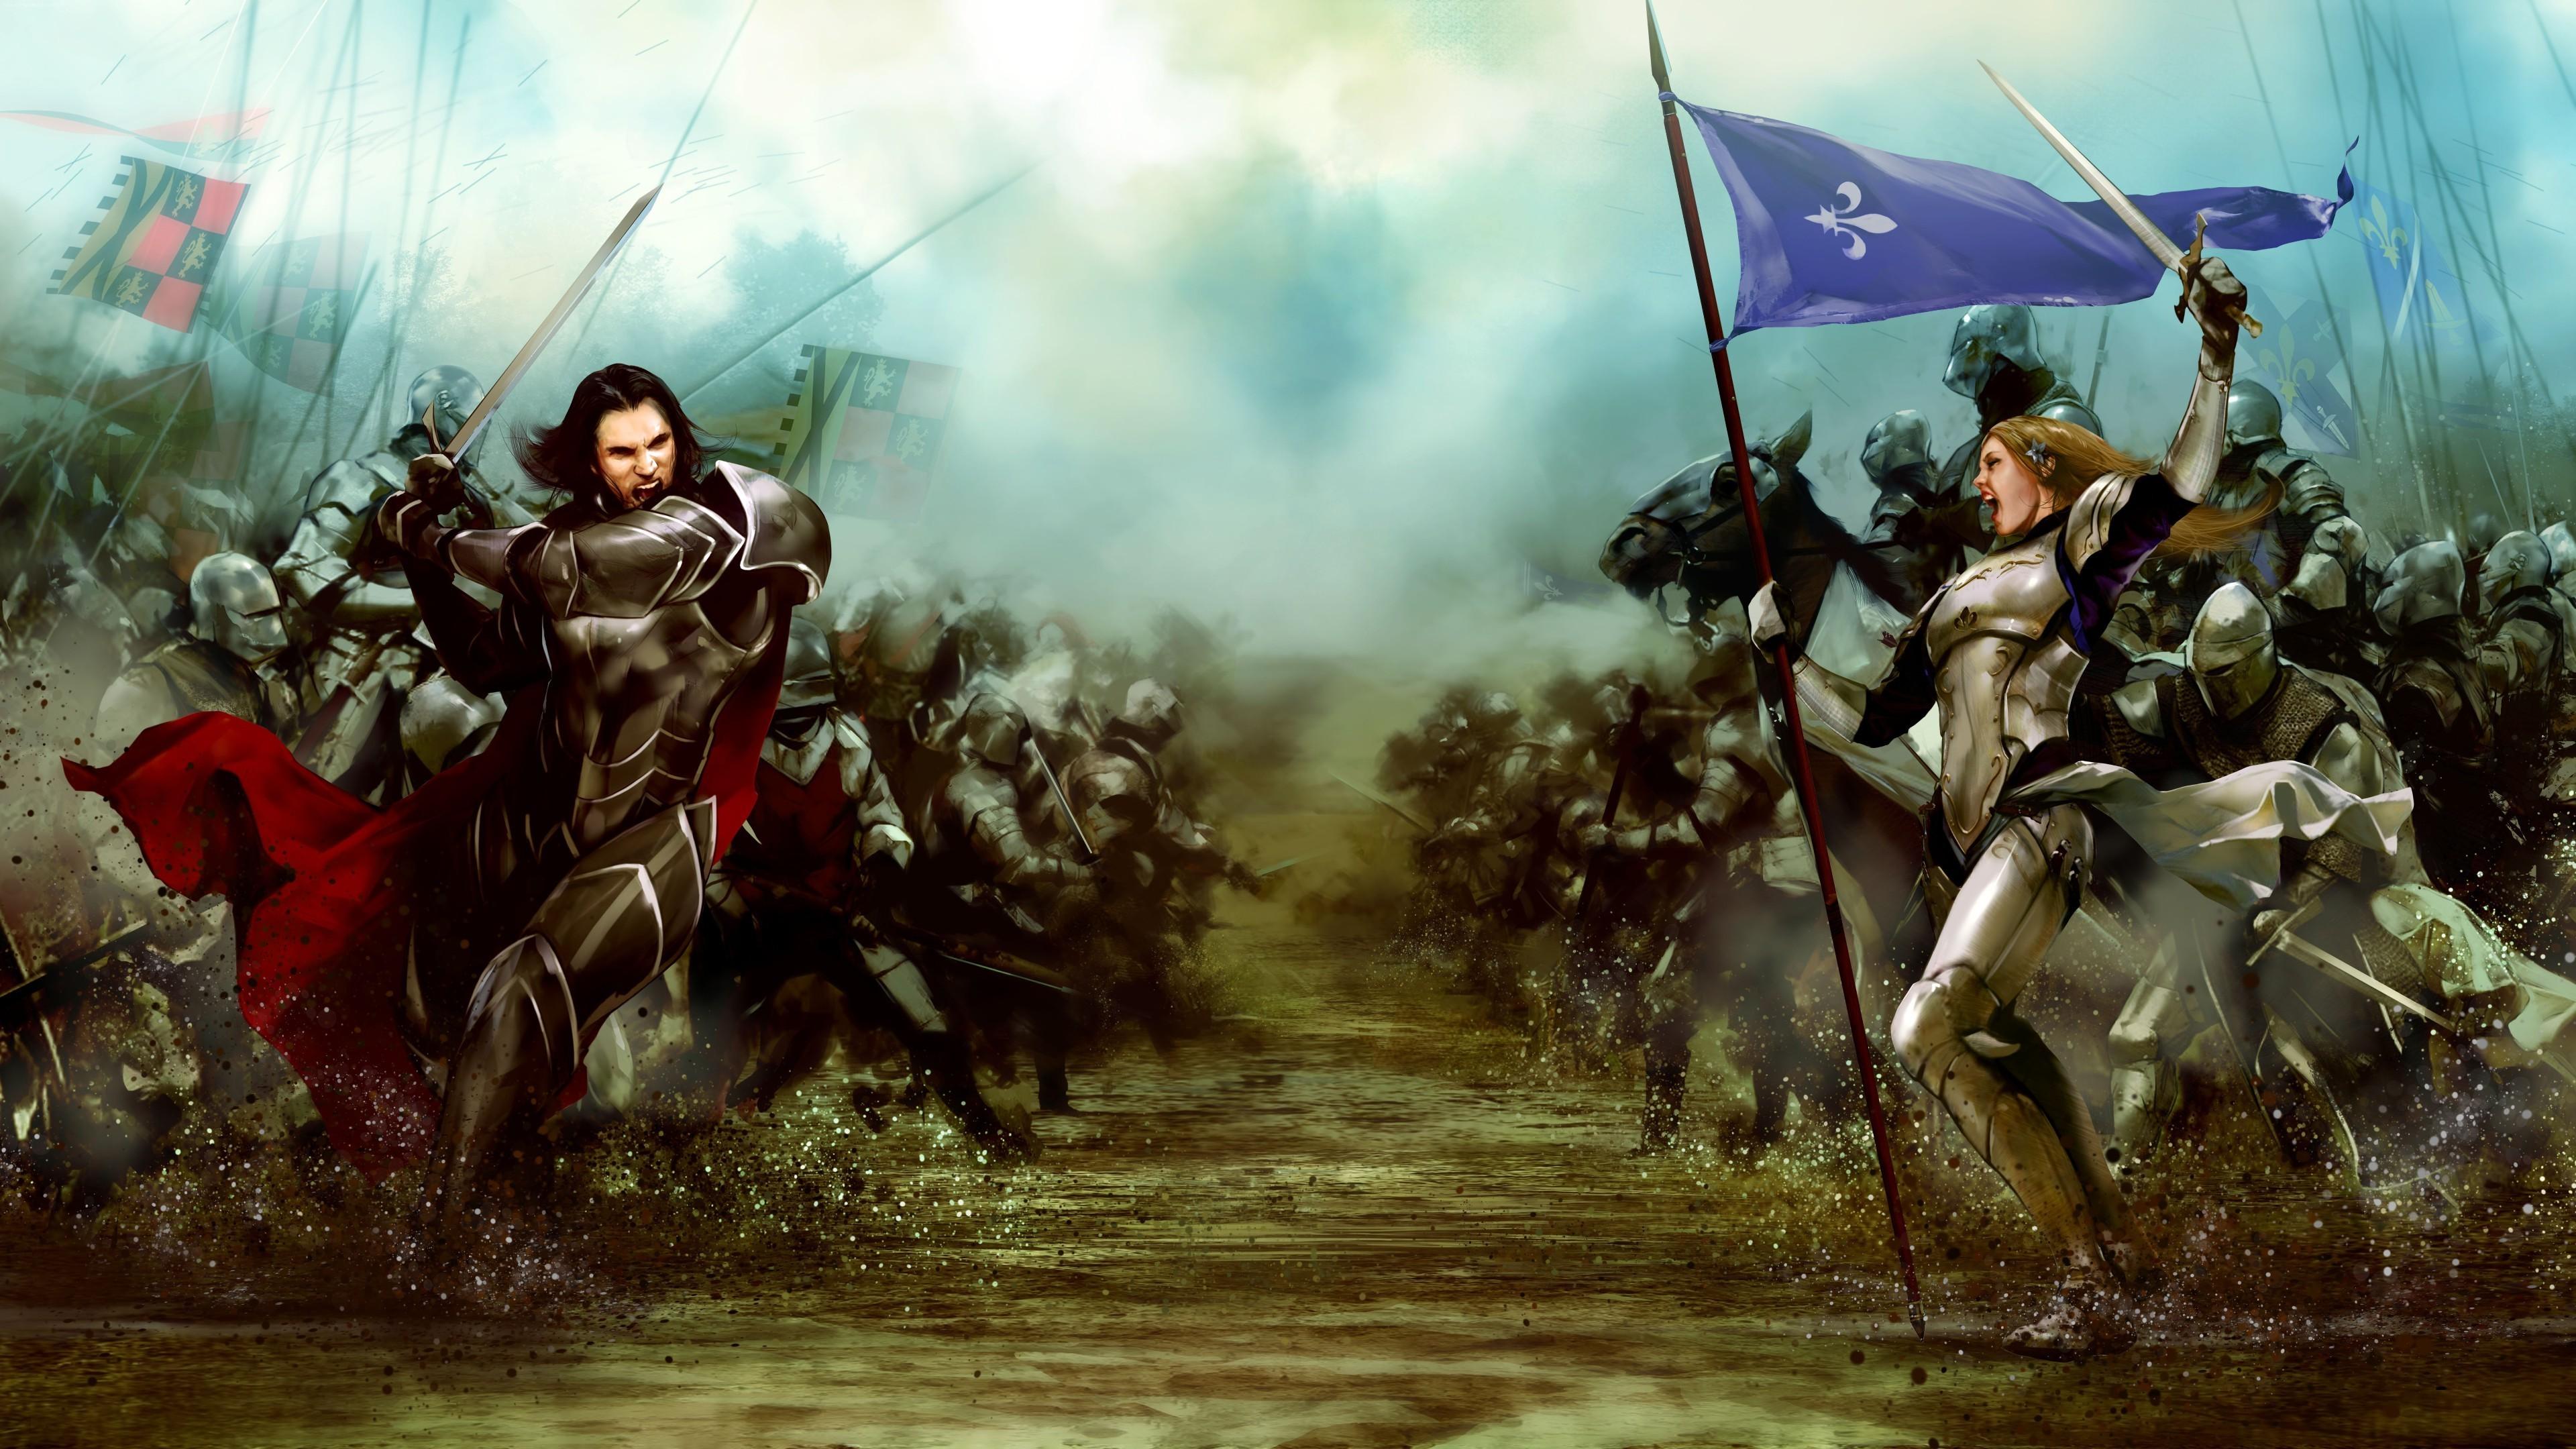 God Of War Wallpaper Hd 3d Download Bladestorm Nightmare War Video Games Knights Concept